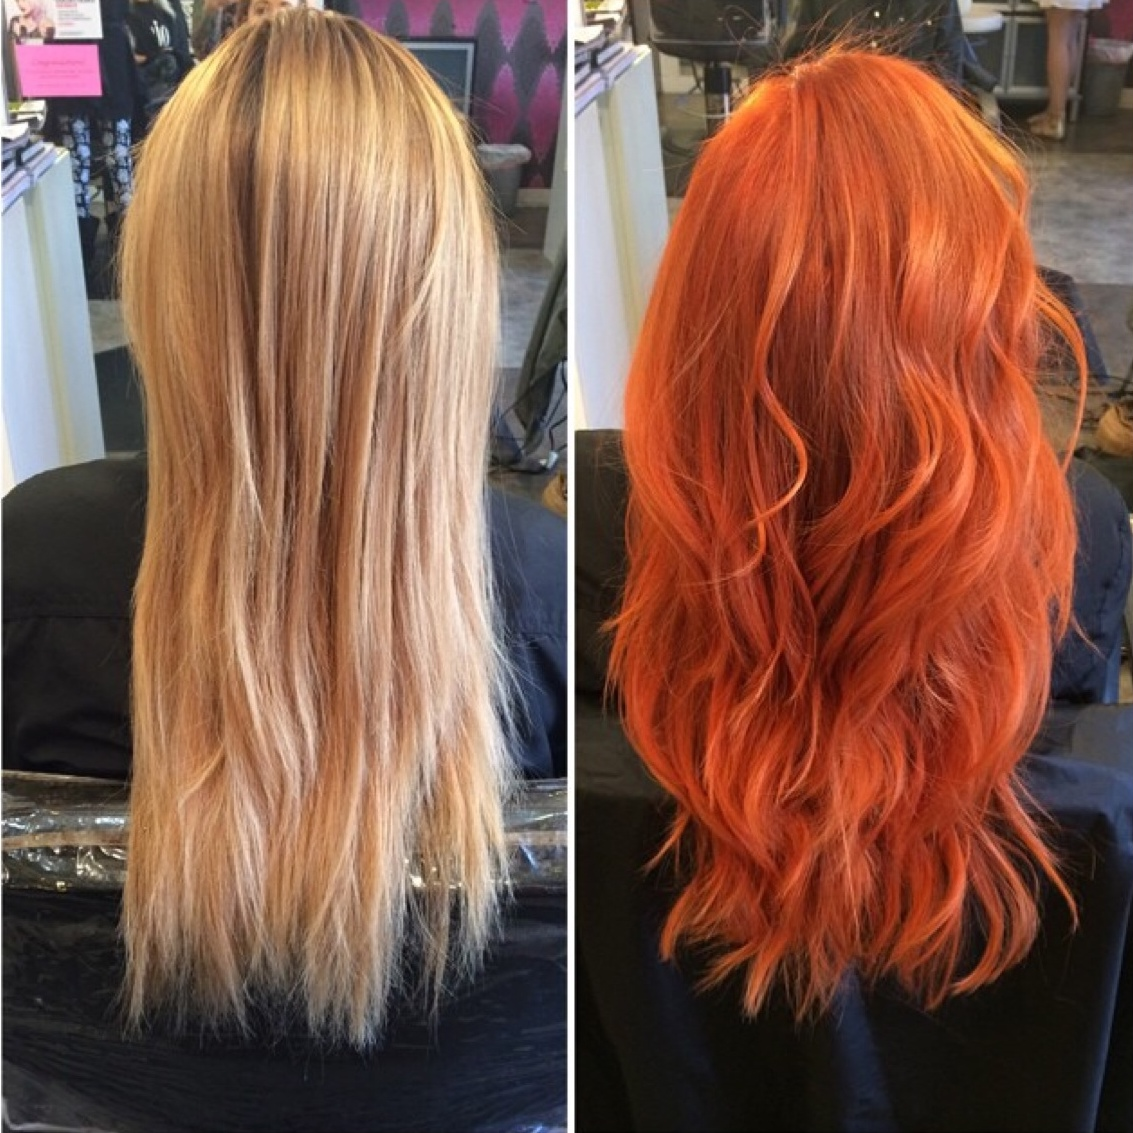 Transformation Fiery Golden Copper Career Modern Salon